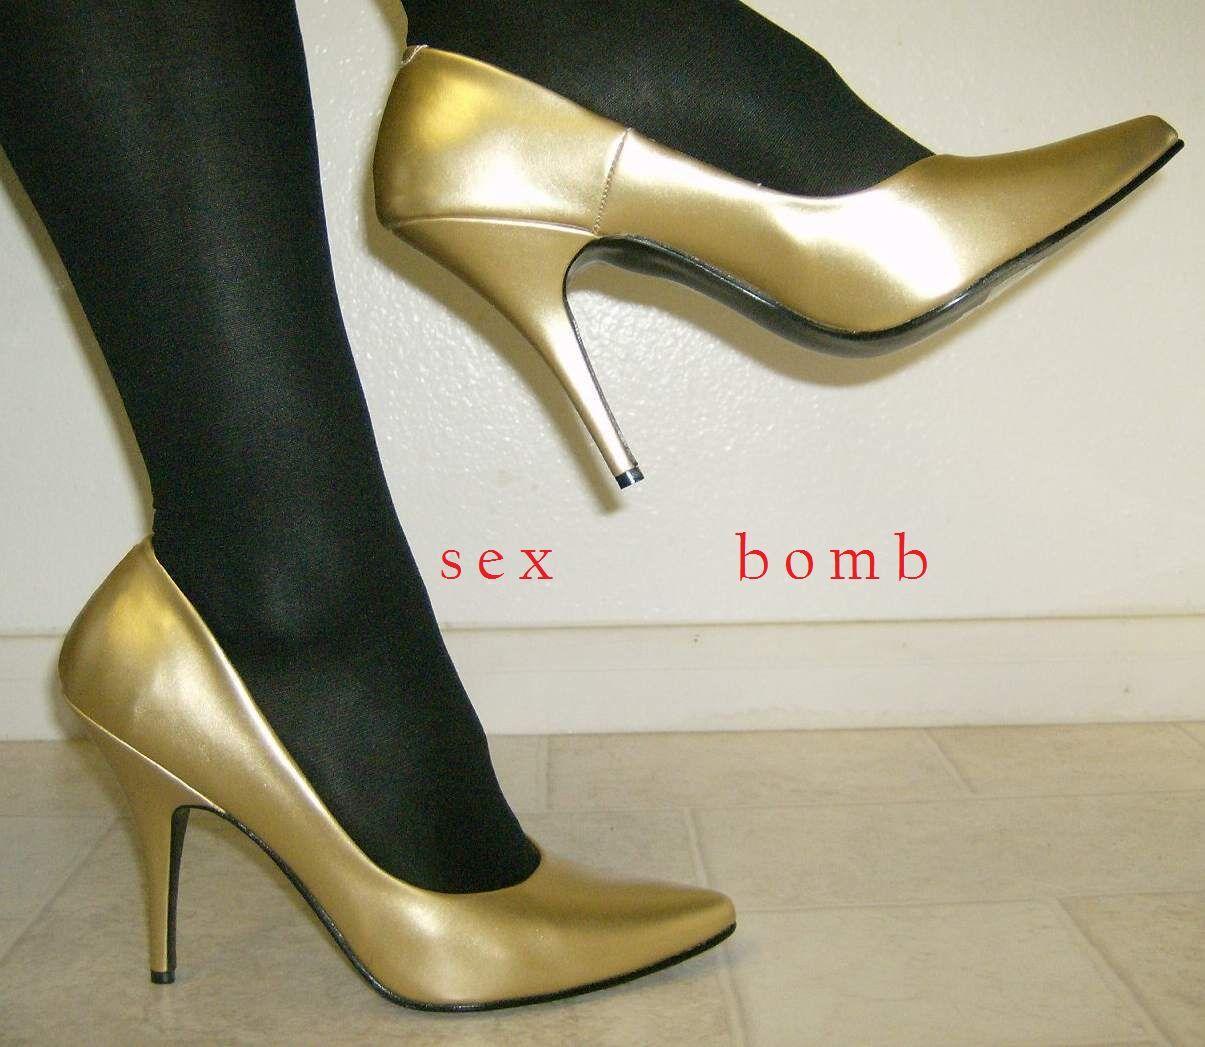 Sexy decolte' Gold Tacco 13 13 13 n. 35 schuhe Fashion GLAMOUR 928ec1